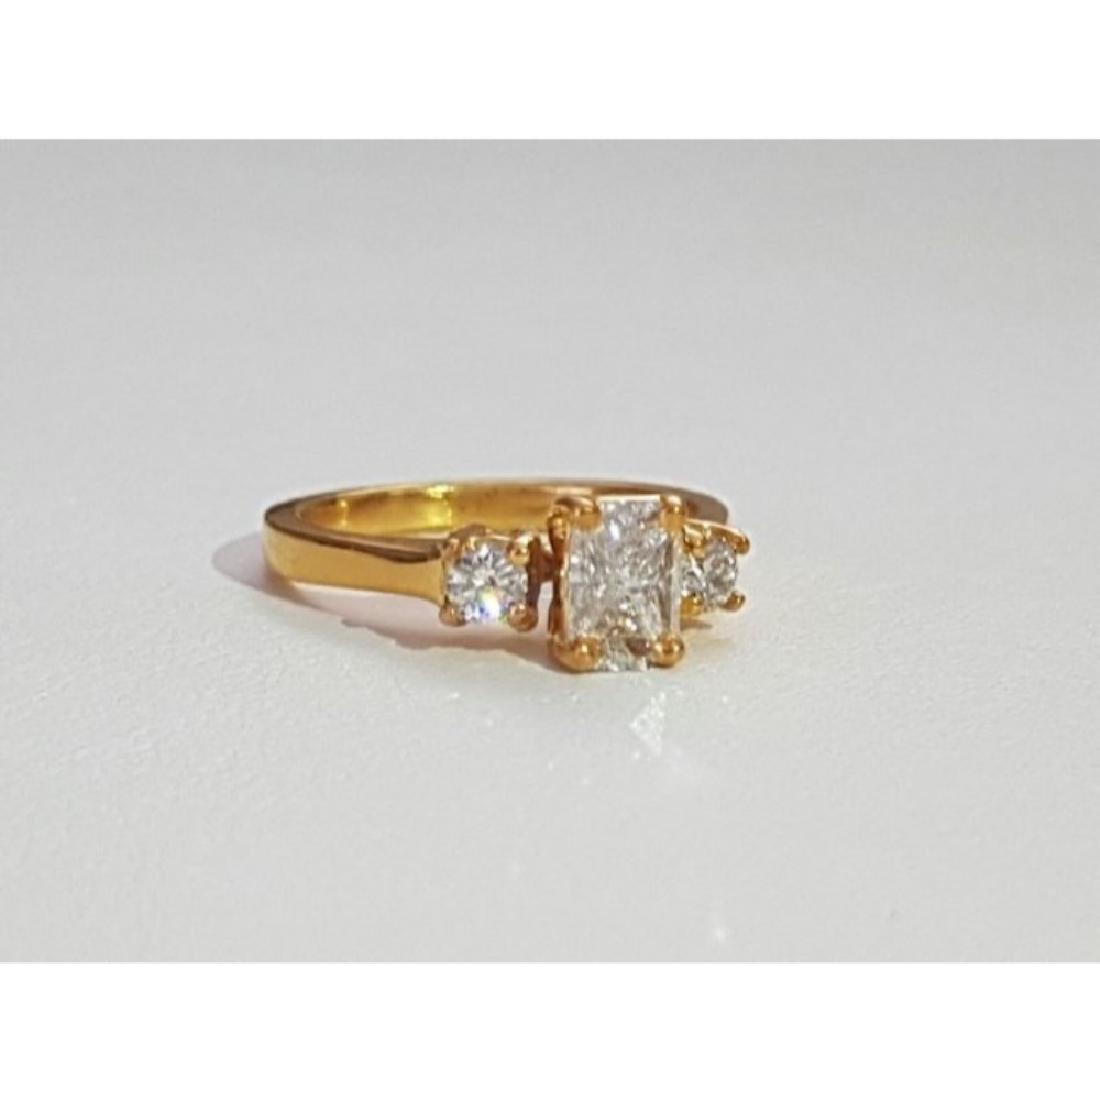 14K Gold and 1.20 Carat VVS White Diamond Ring (GIA) - 2